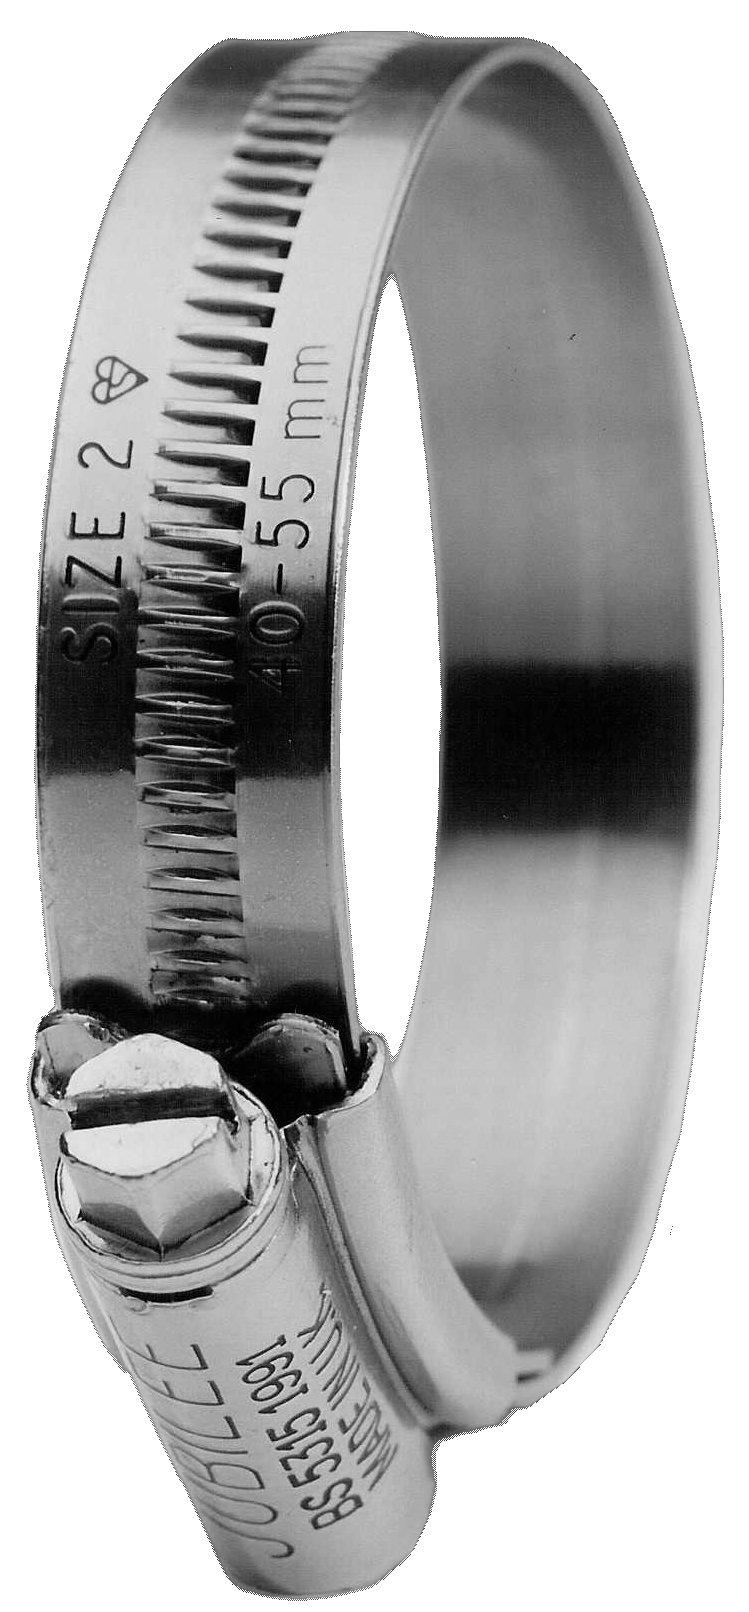 10 x JCS HI-GRIP HOSE CLIPS SIZE 55 ZINC PLATED 40-55mm JUBILEE TYPE 2 CLAMP